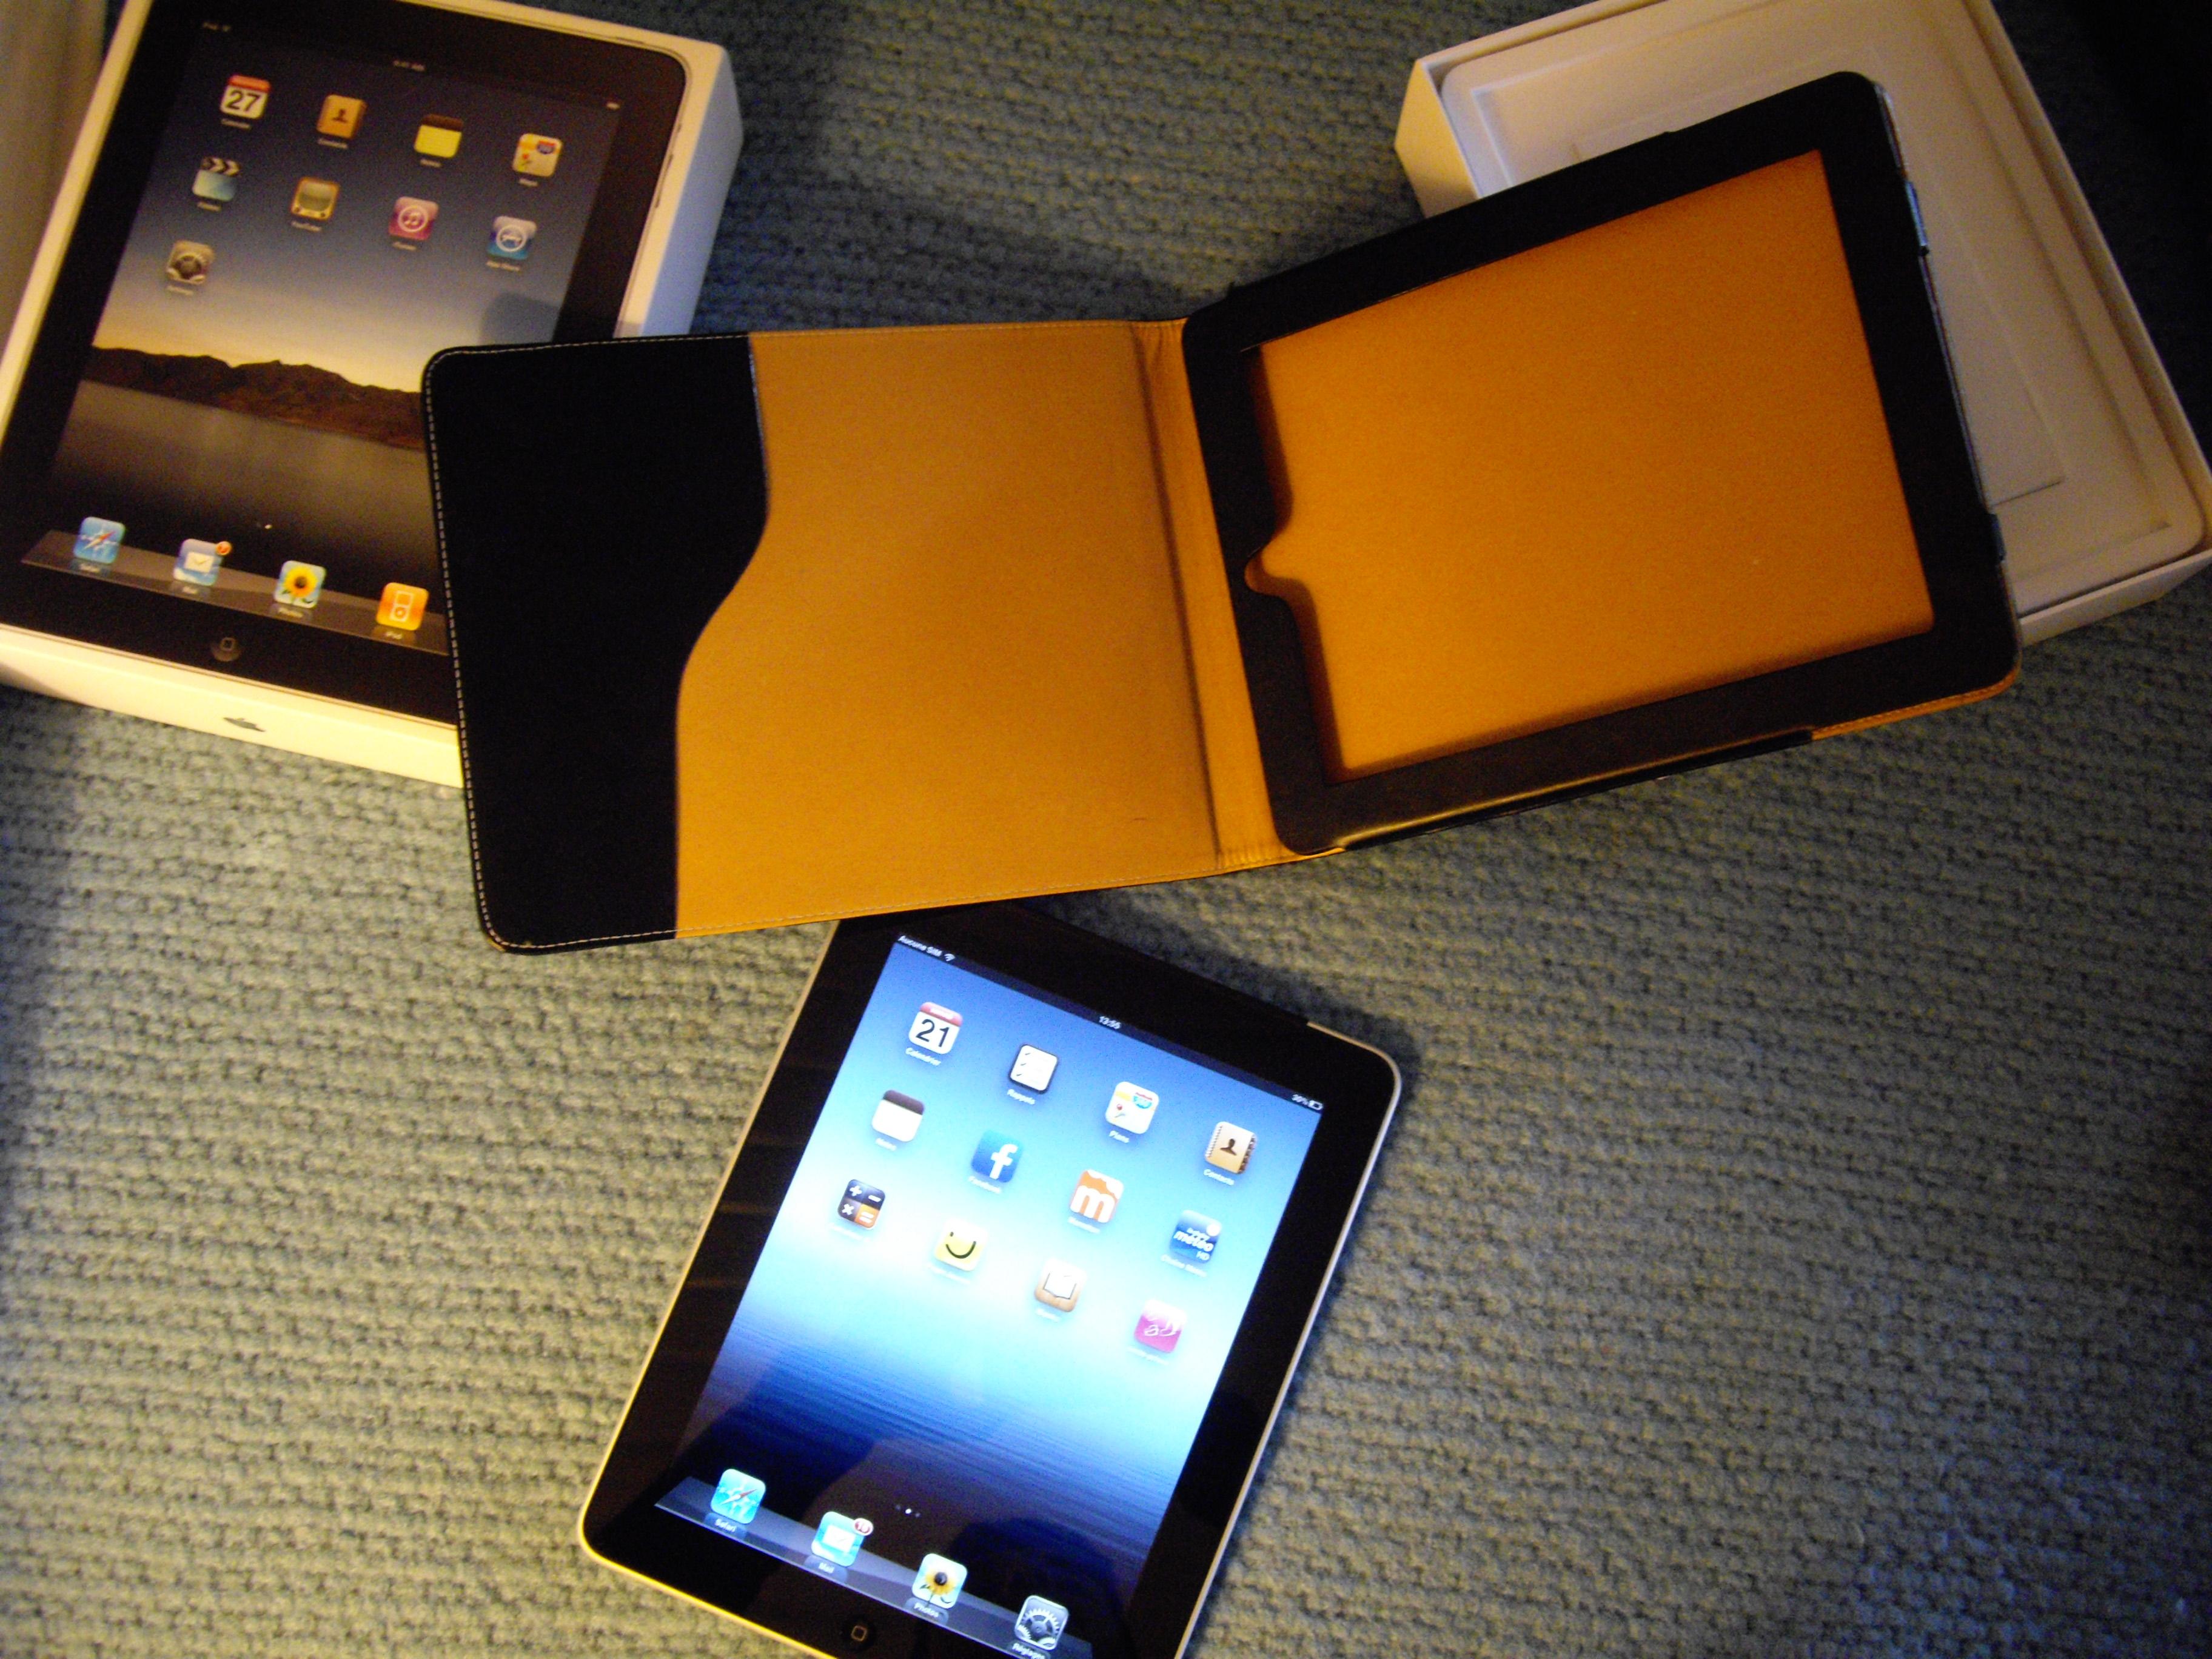 http://ganoninc.free.fr/extra/iPad/IMGP8537.JPG